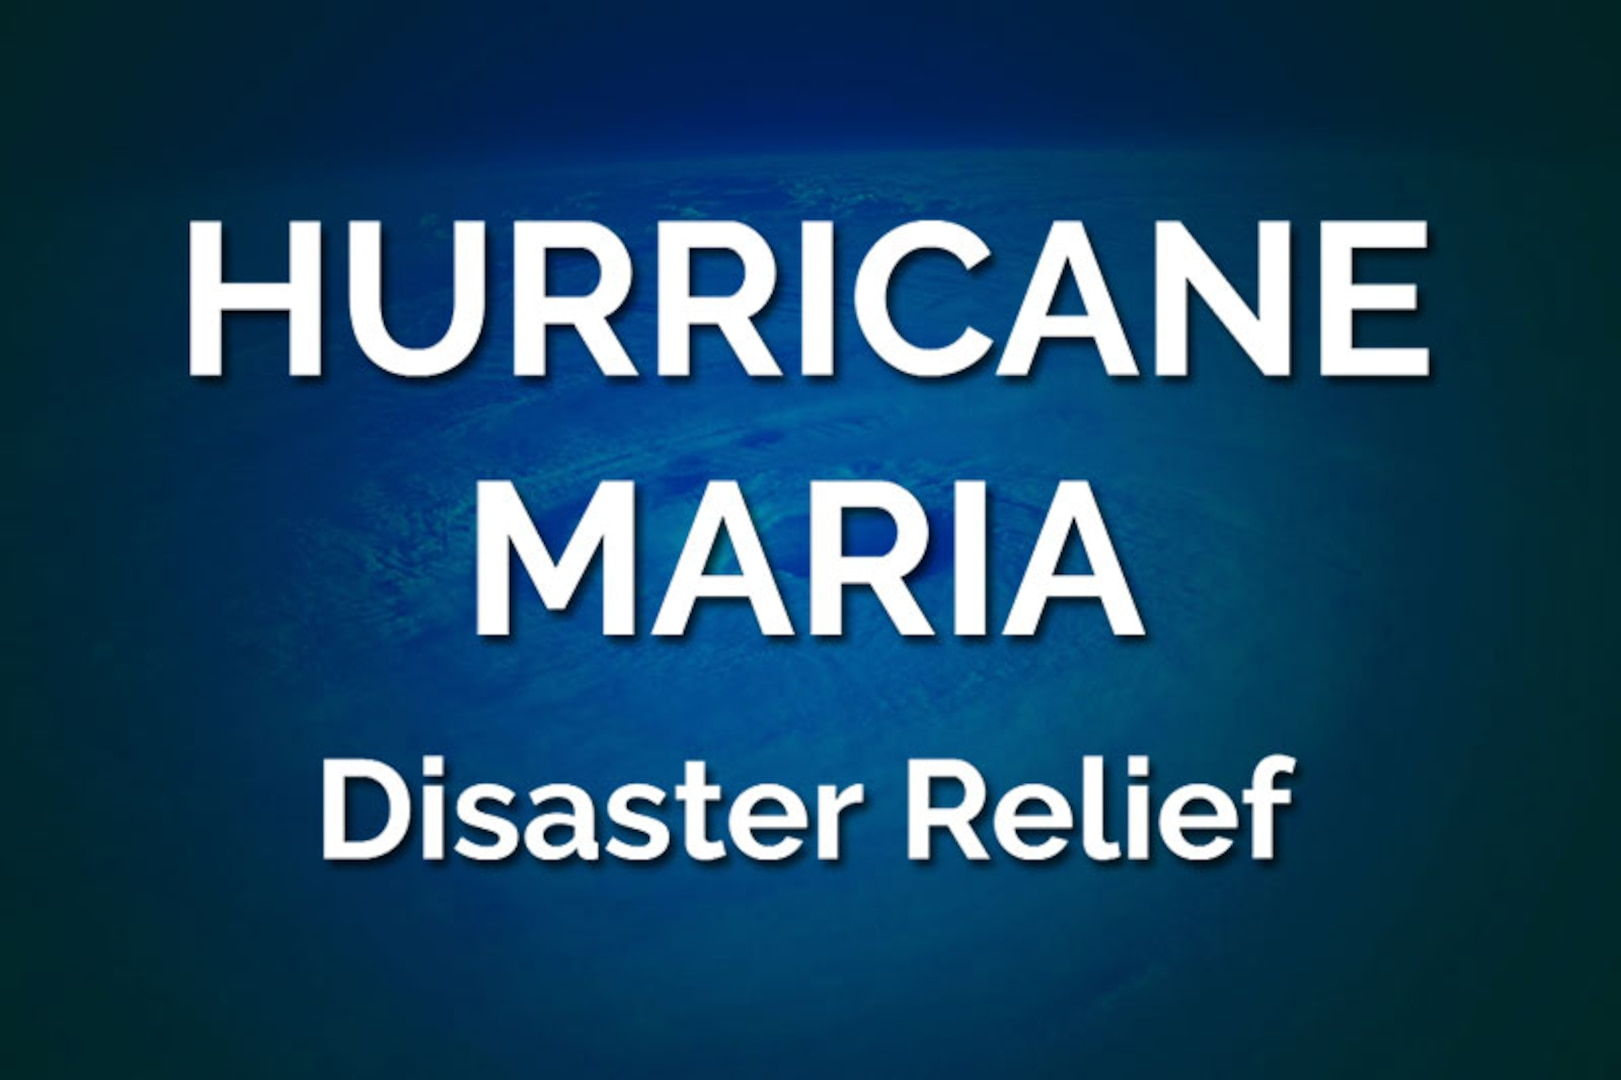 Hurricane Maria - Disaster Relief